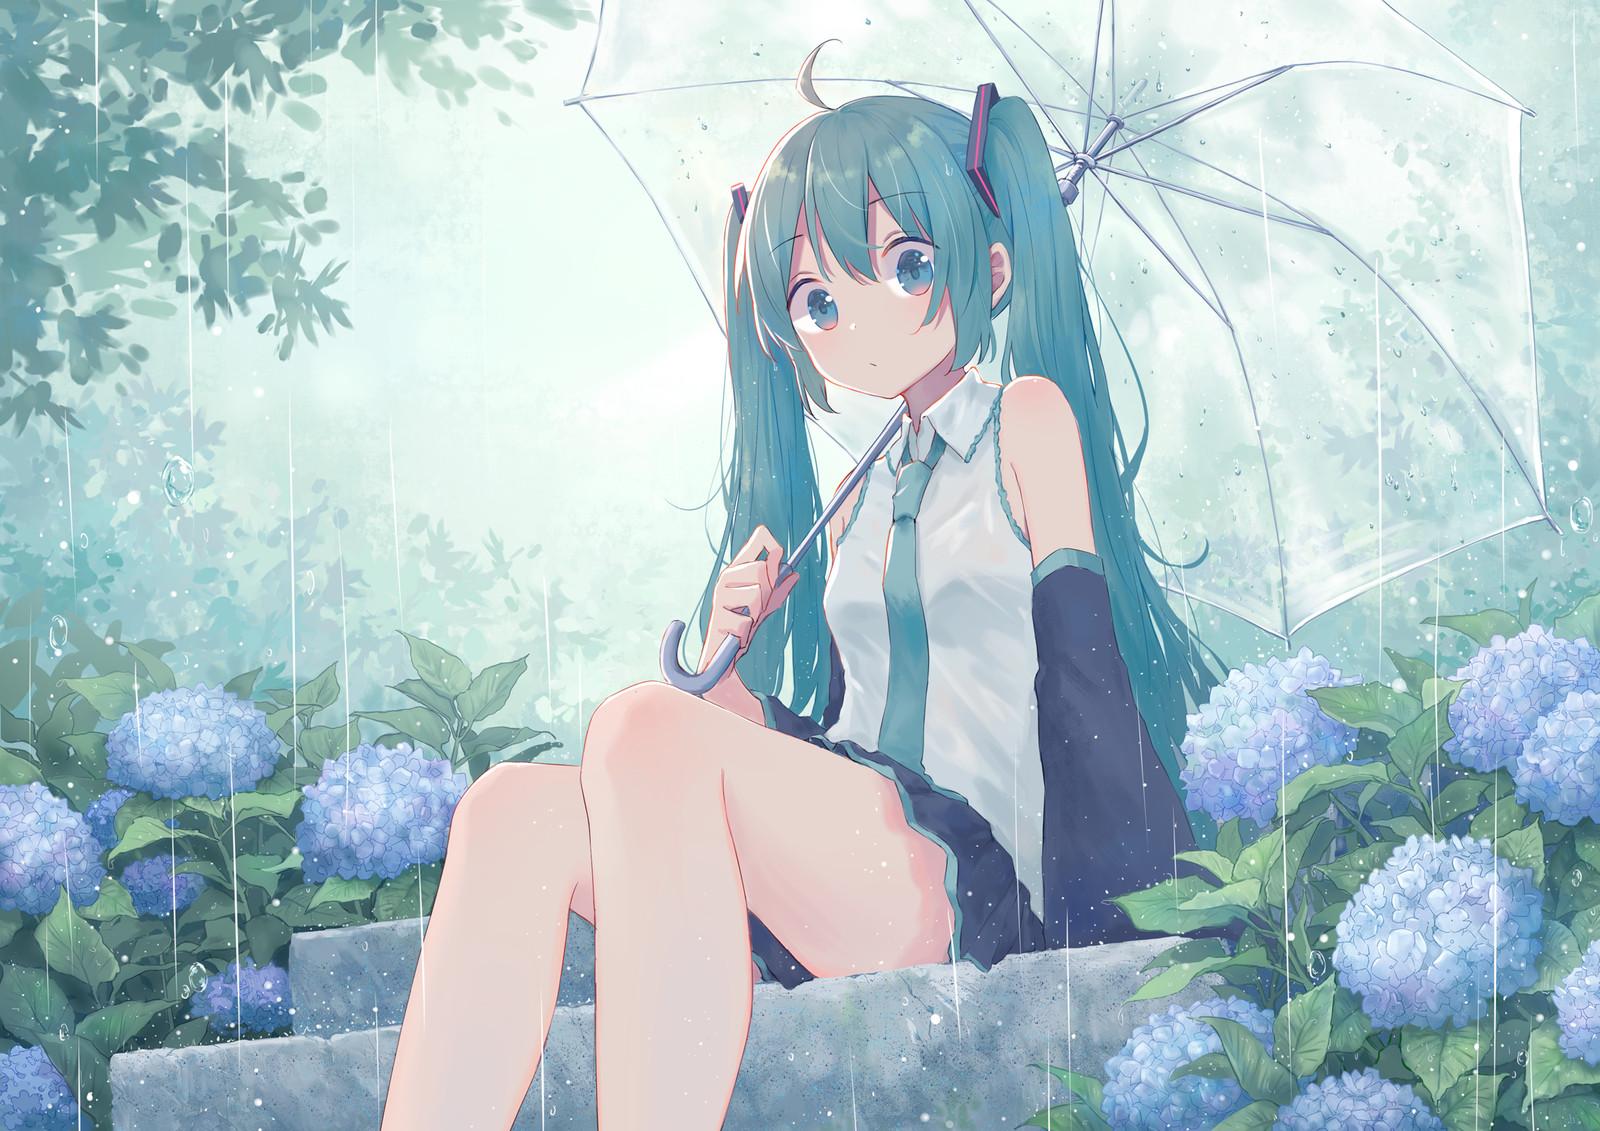 无题 - 雨陌